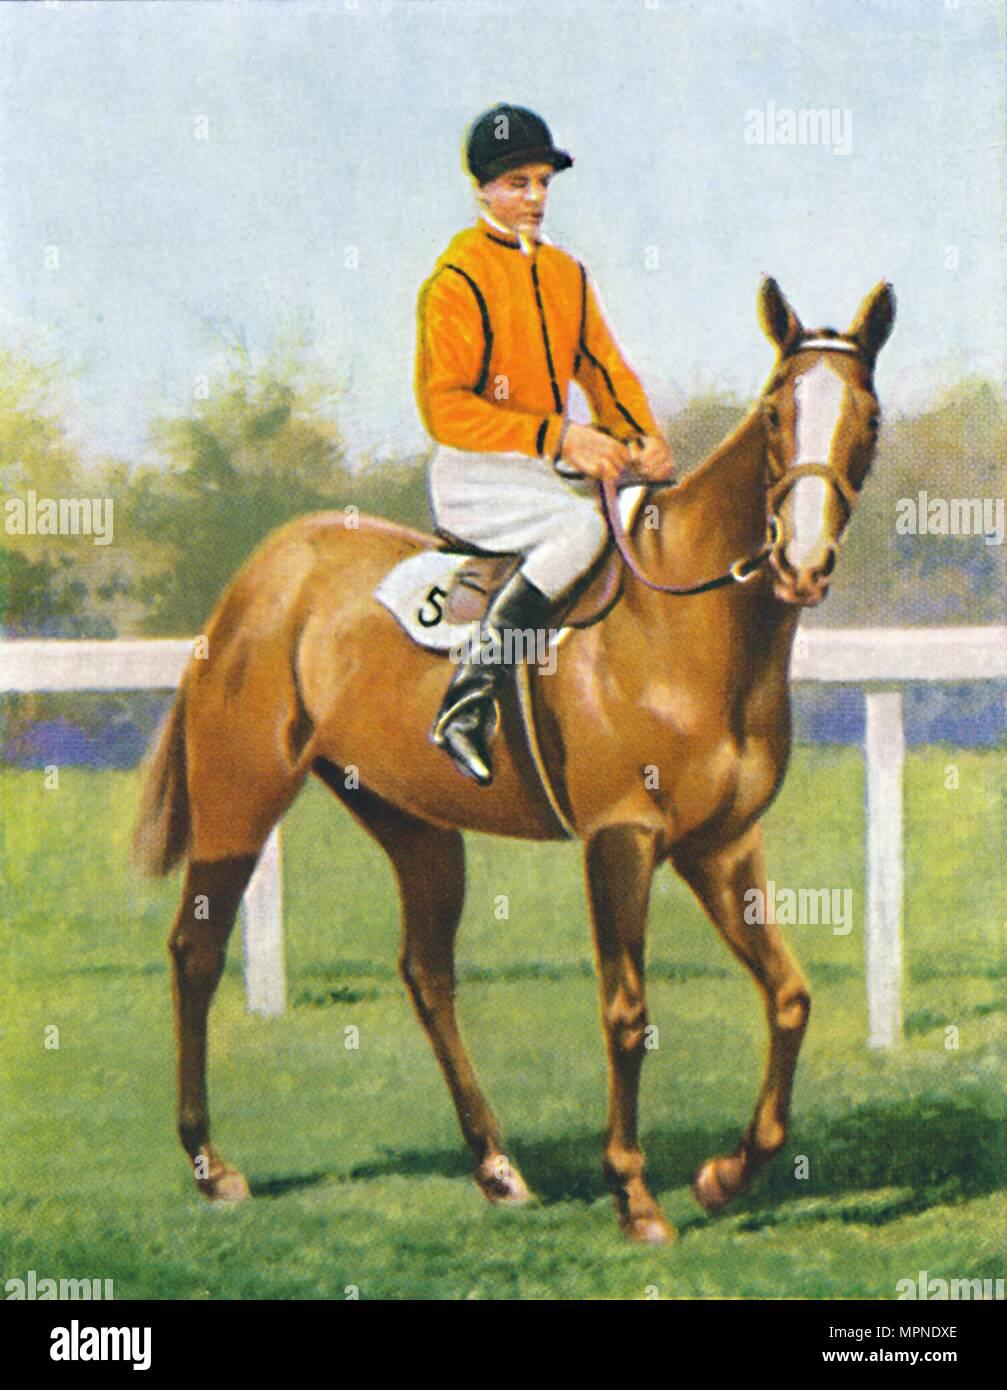 Free Fare, Jockey: B. Hobbs', 1939. Artist: Unknown. - Stock Image